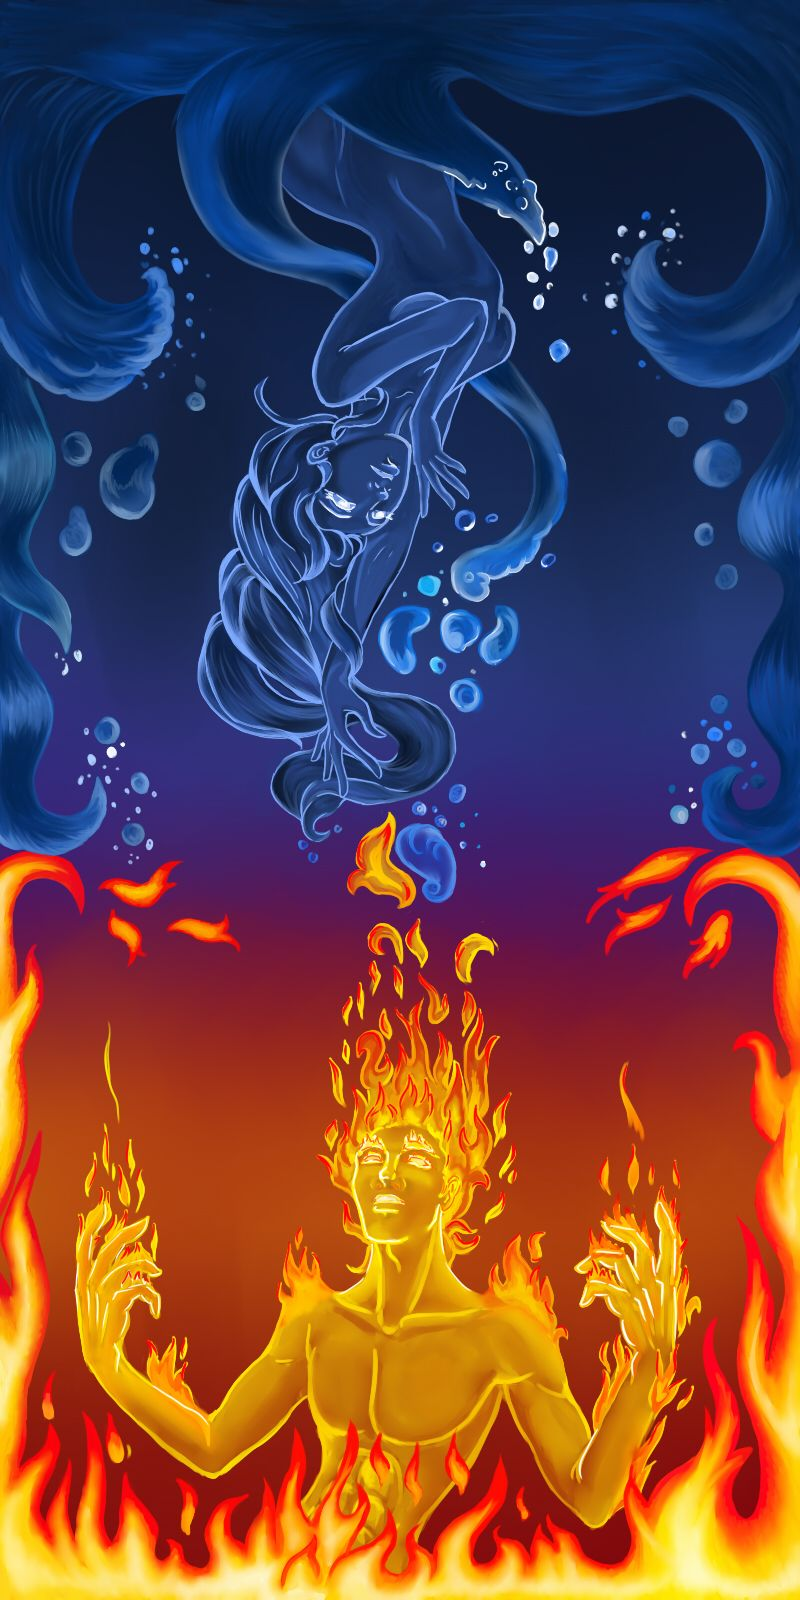 Water&Fire by red-eye-girl.